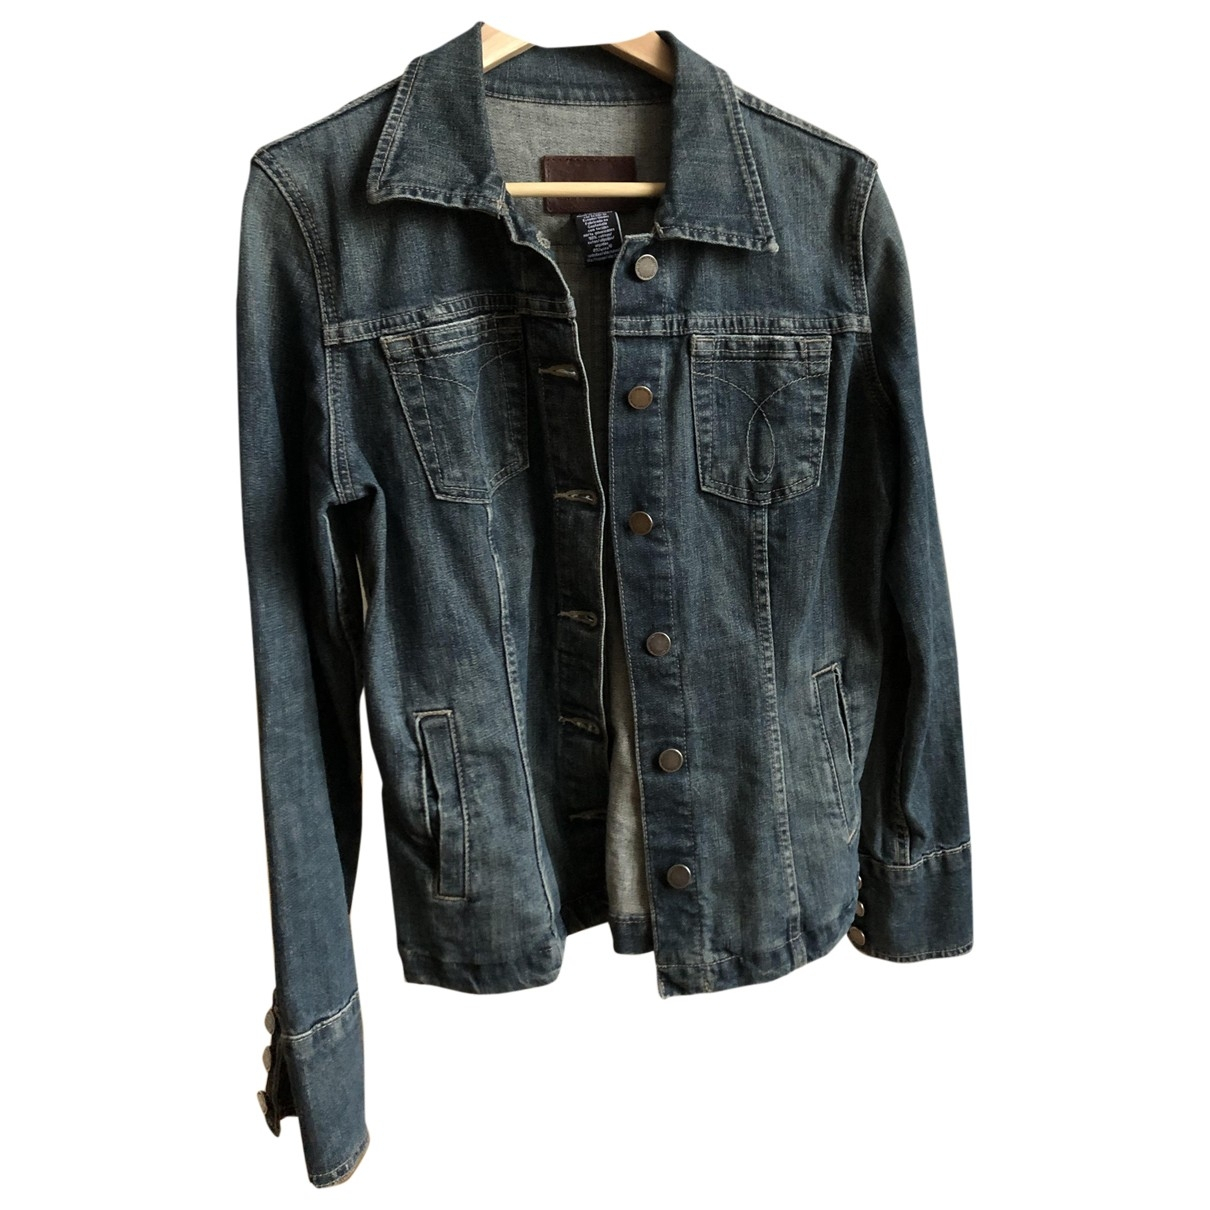 Calvin Klein \N Blue Denim - Jeans jacket for Women M International